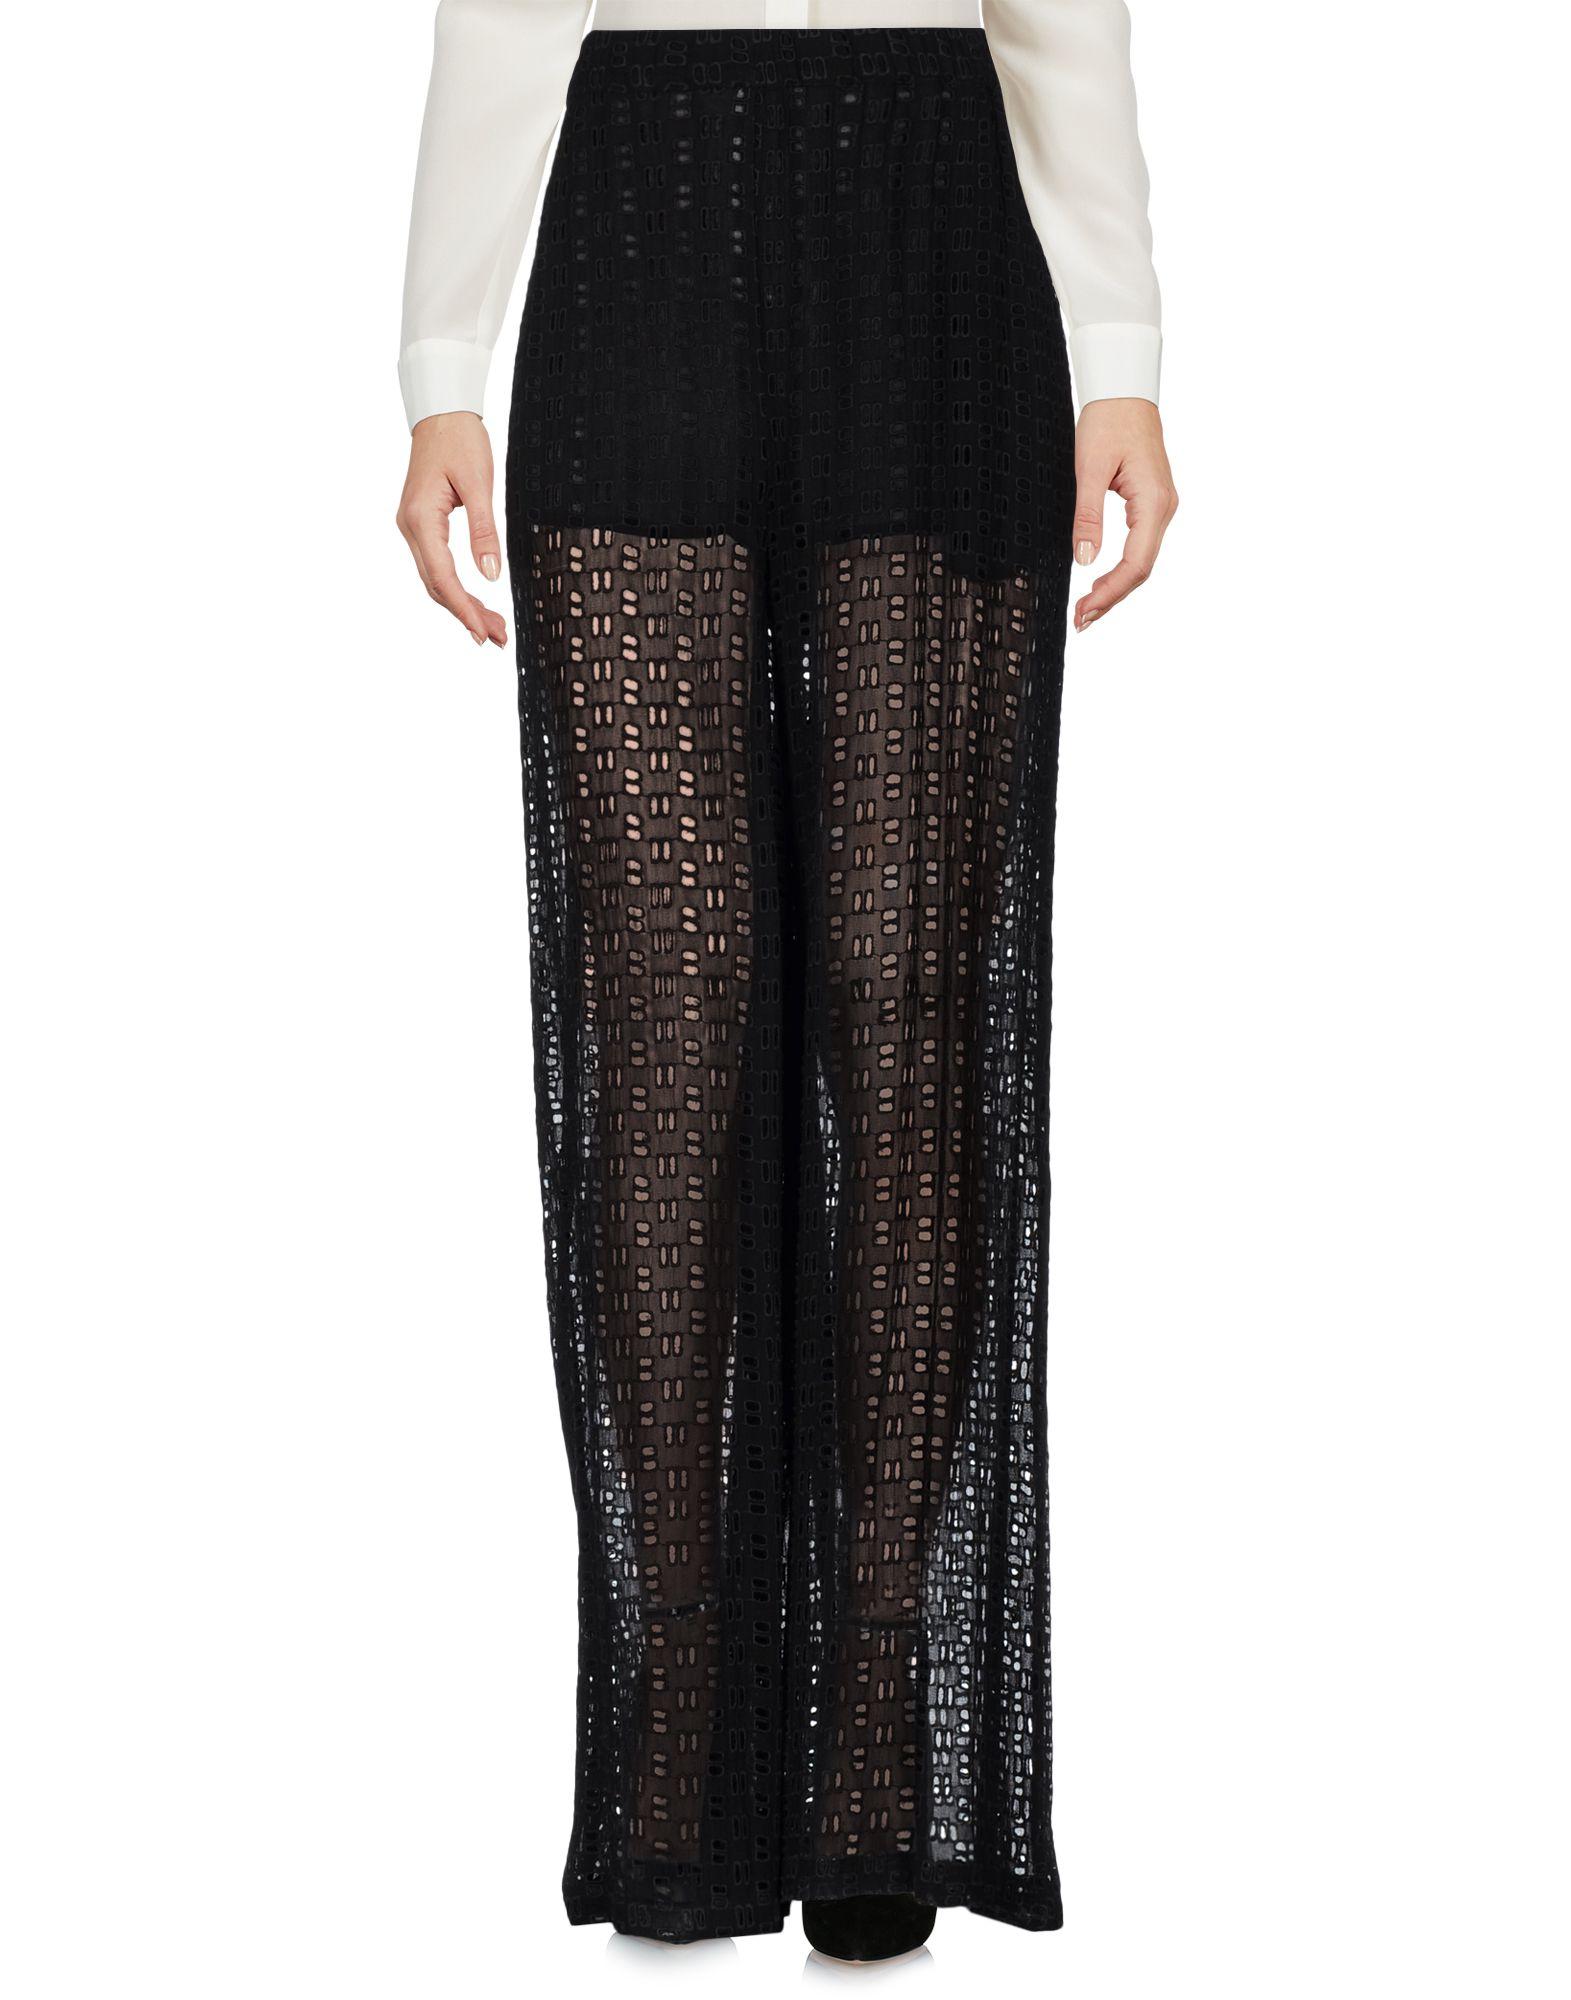 Pantalone Pinko Donna - Acquista online su